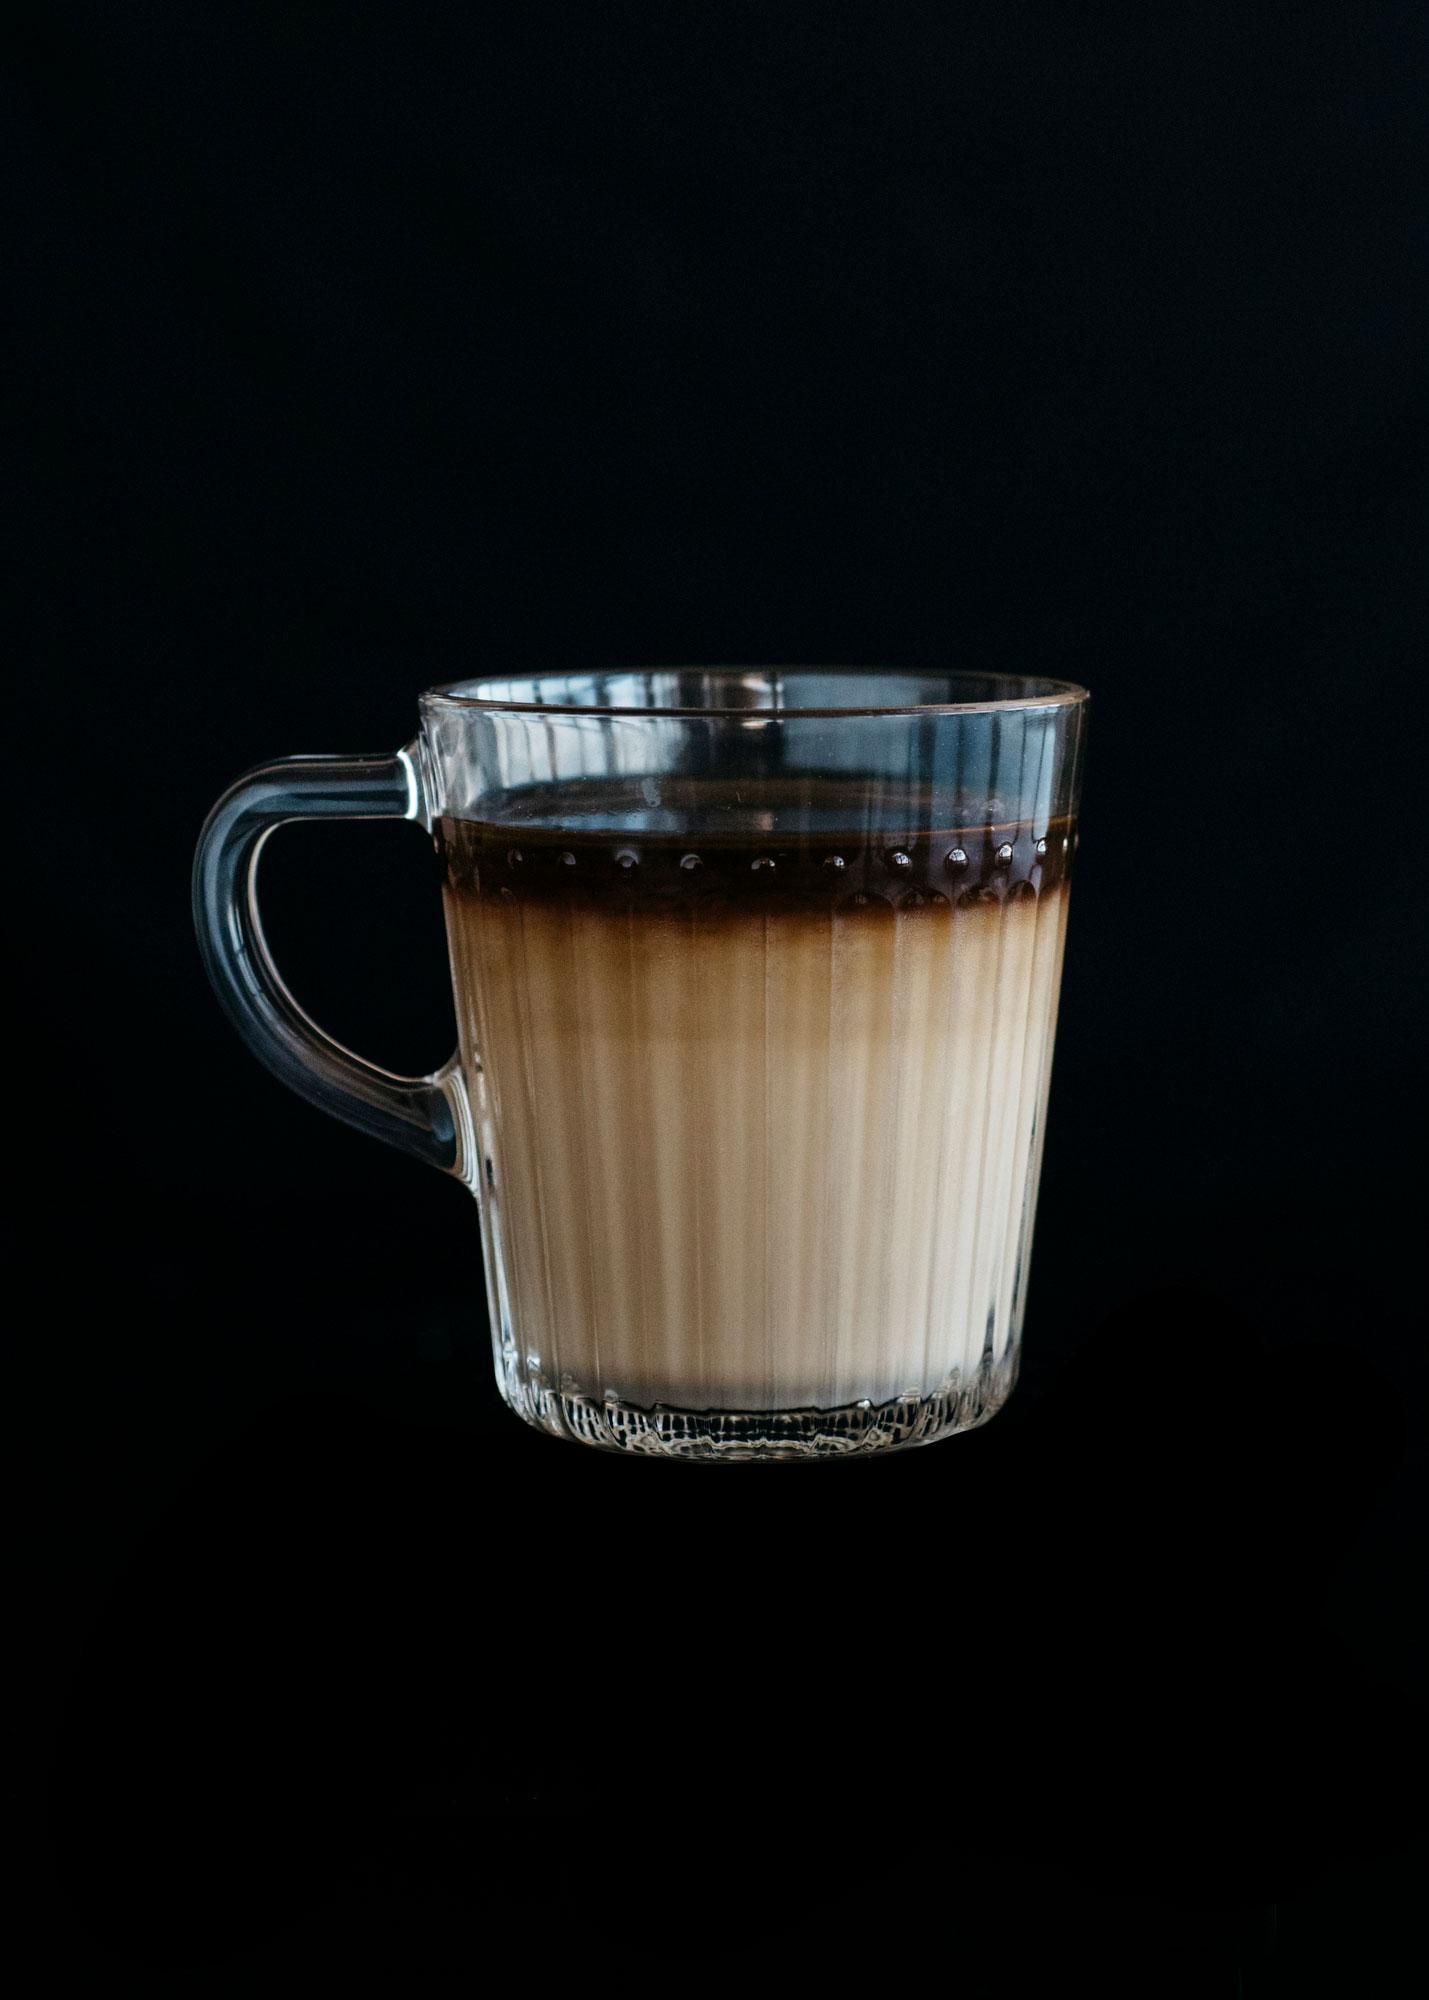 Coffee_Splash_Ikea_cup_Rebecca_Peloquin_Los_Angeles_Beverage_Photographer.JPG